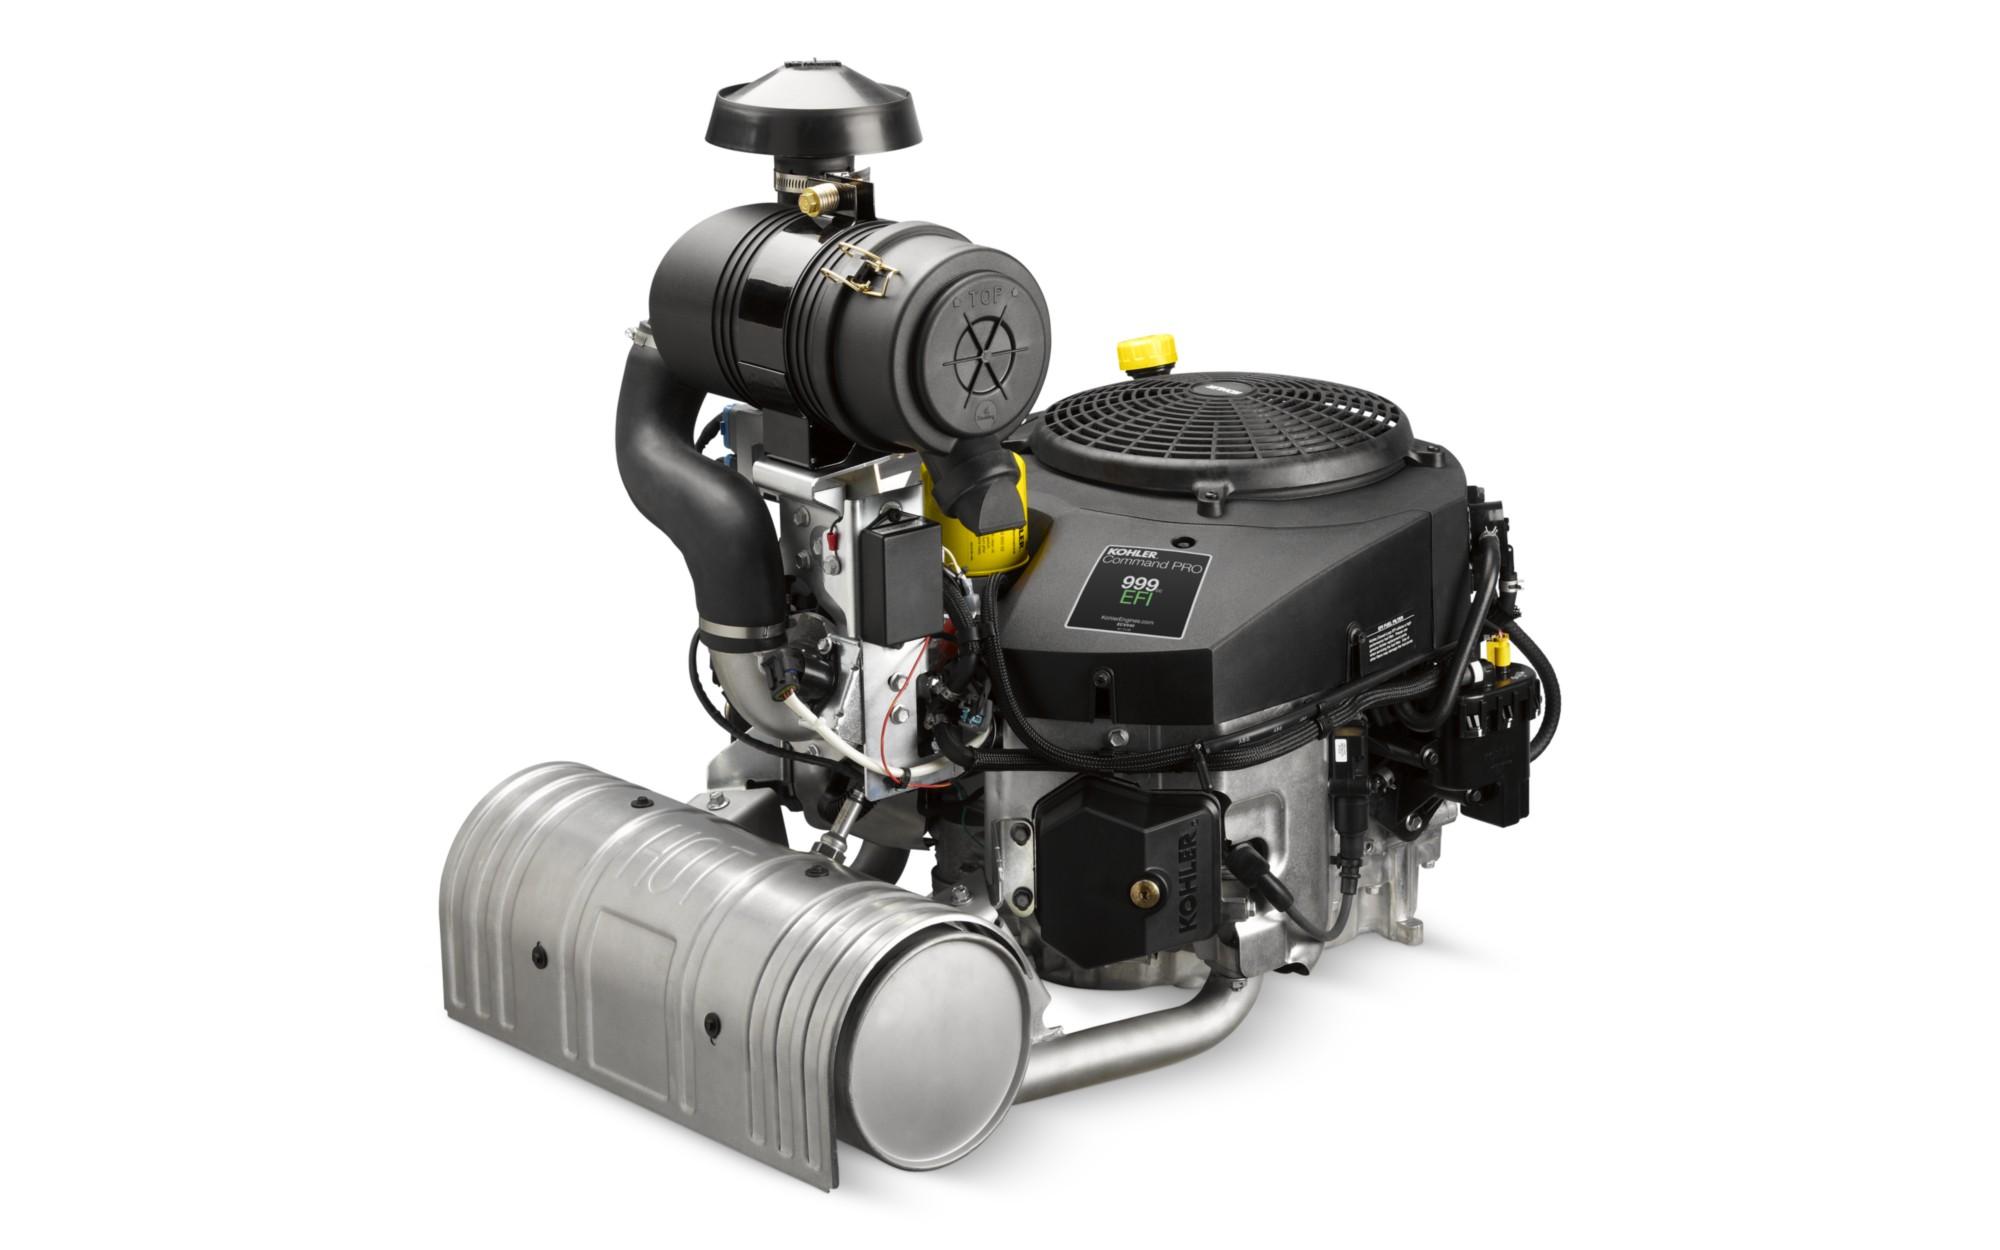 Ecv980 Command Pro Efi Kohler 19 Hp Engine Parts Diagram Wiring Schematic